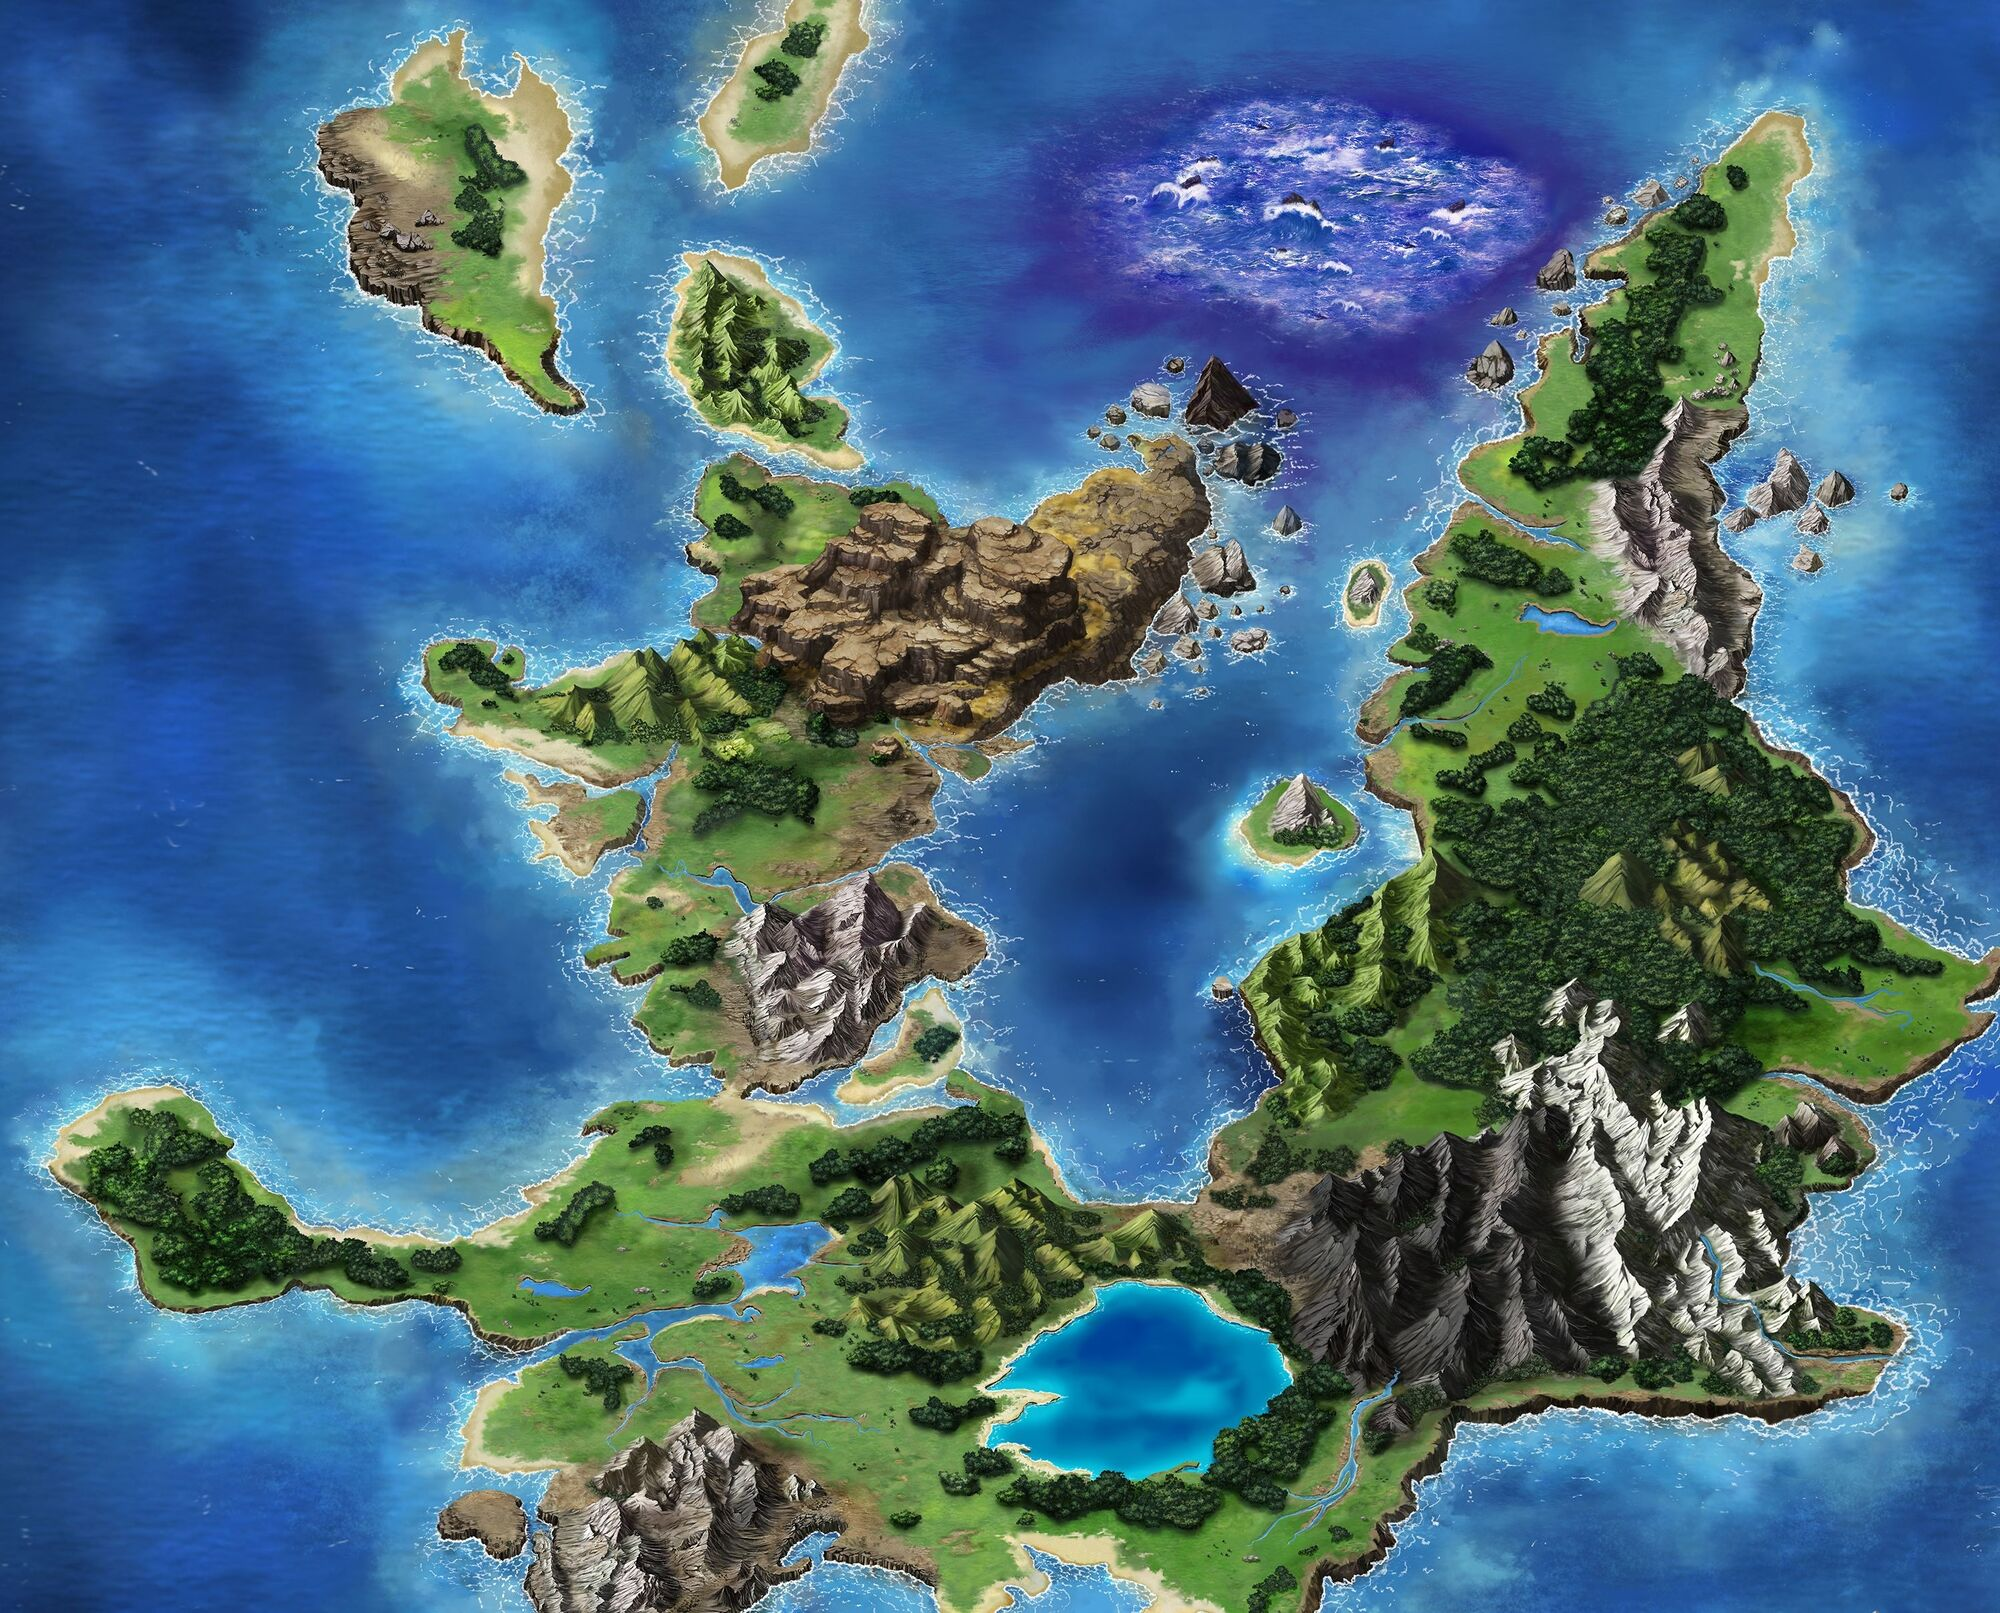 Olderion Final Fantasy Wiki Fandom Powered By Wikia